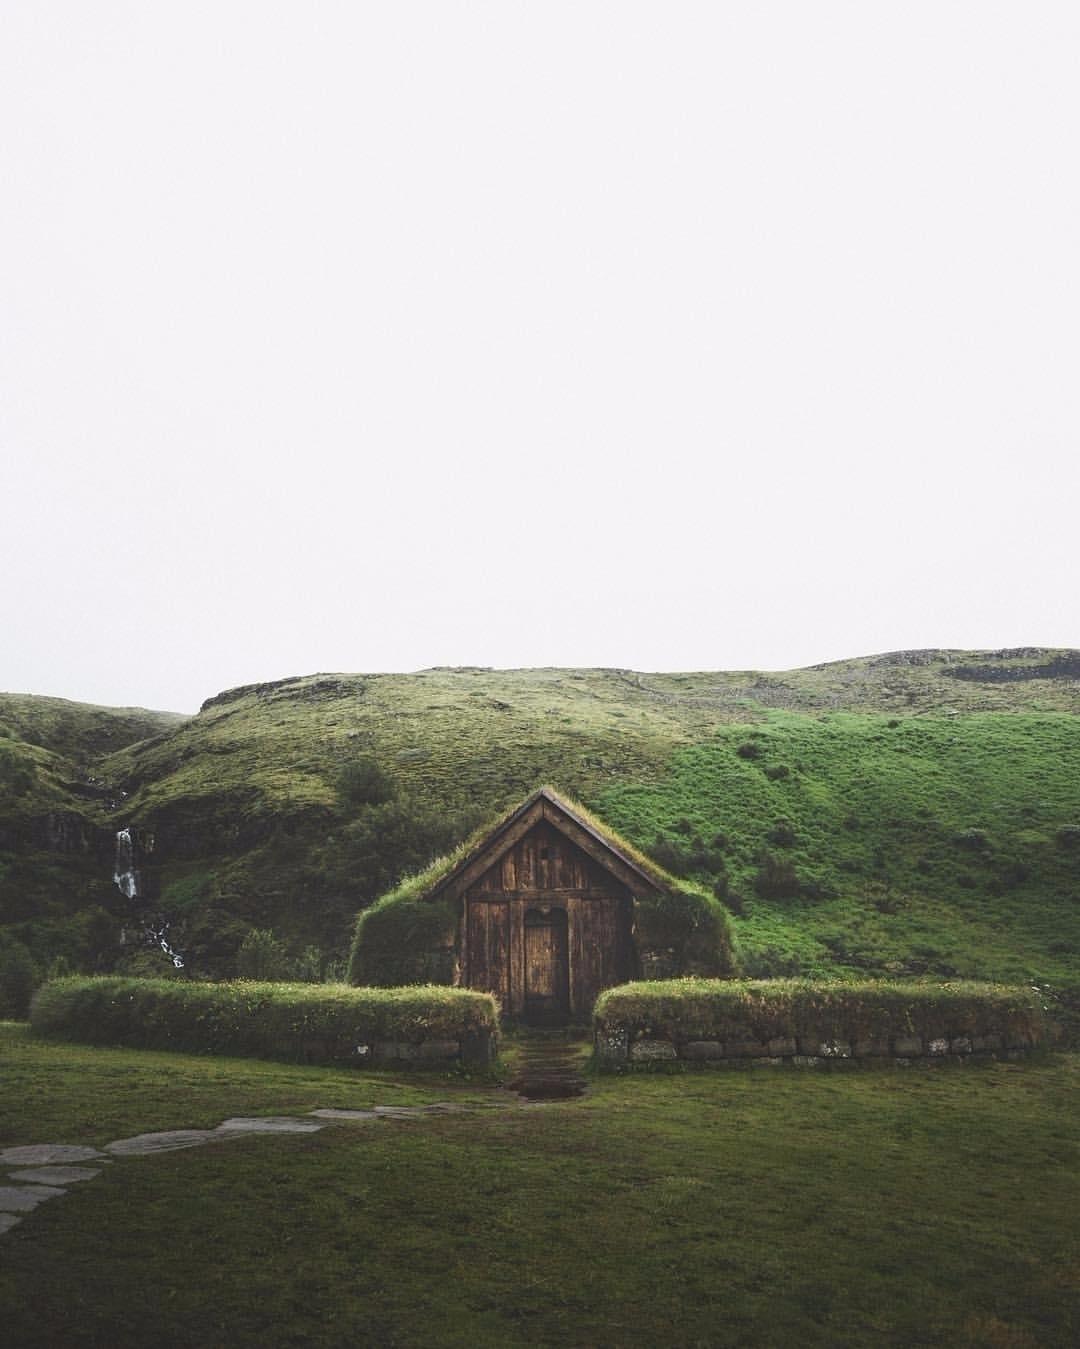 Benjamin Hardman - photo, insland - thetreemag | ello